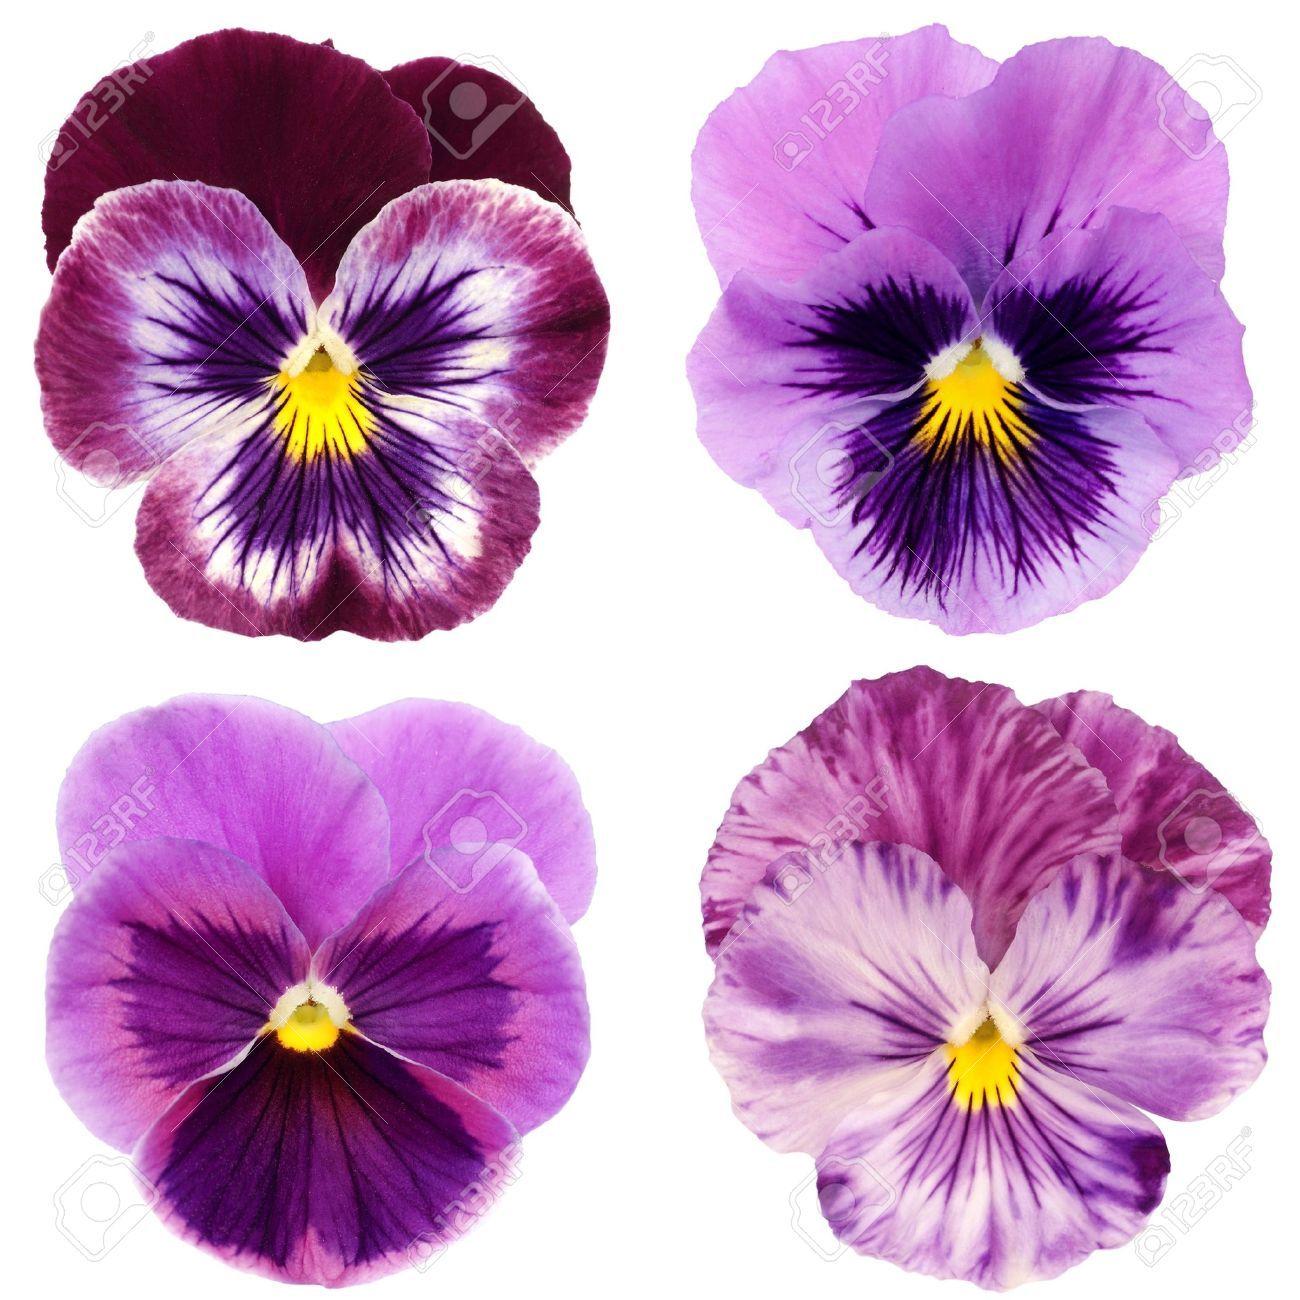 Pin By Barbie On Color Graphics Flowers Leaves Trees Pansies Flowers Flower Painting Watercolor Flowers